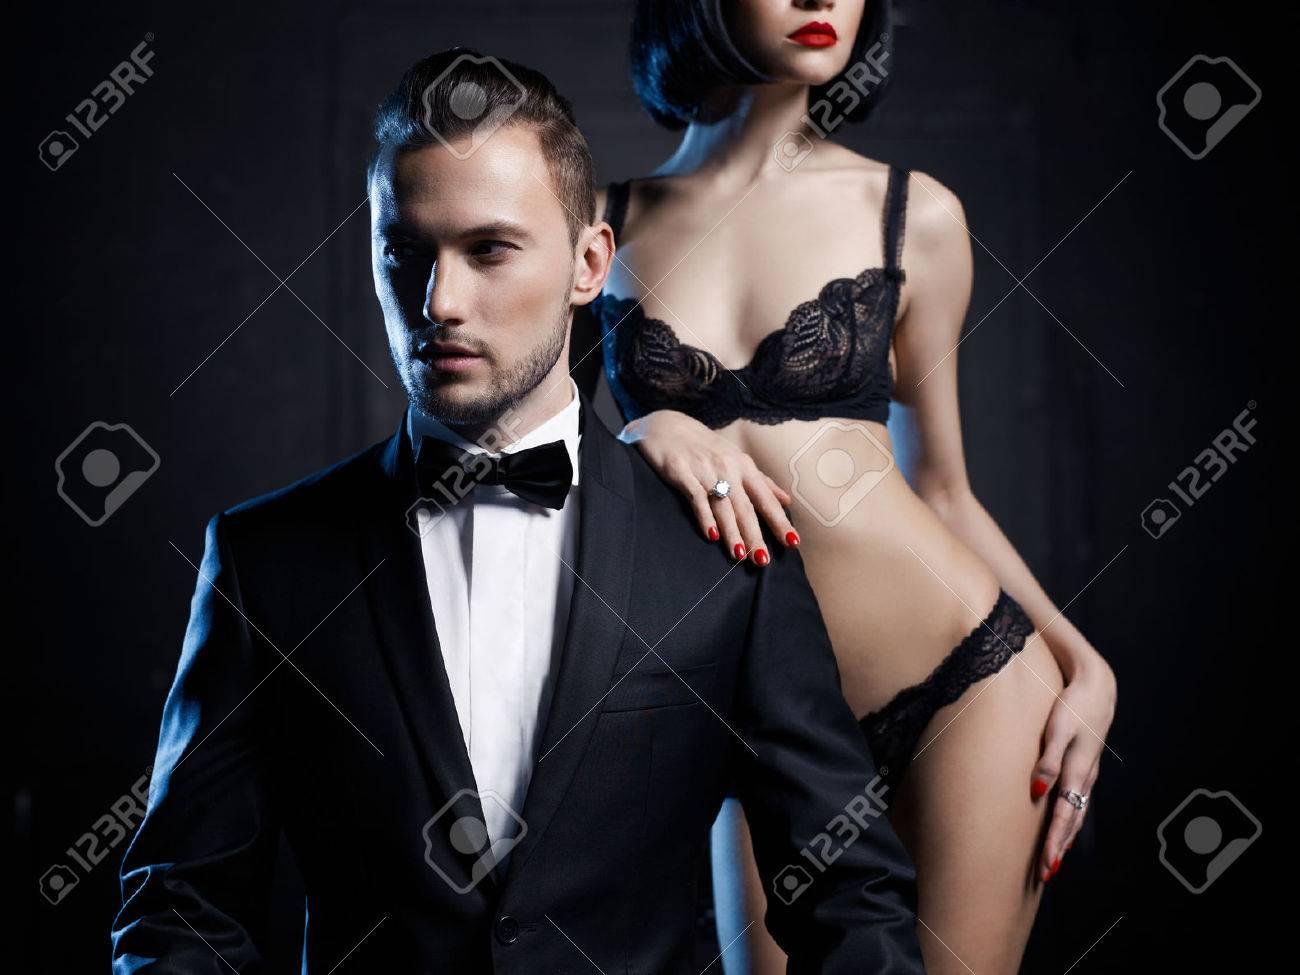 Fashion studio photo of a sensual couple in lingerie and a tuxedo Standard-Bild - 40847929